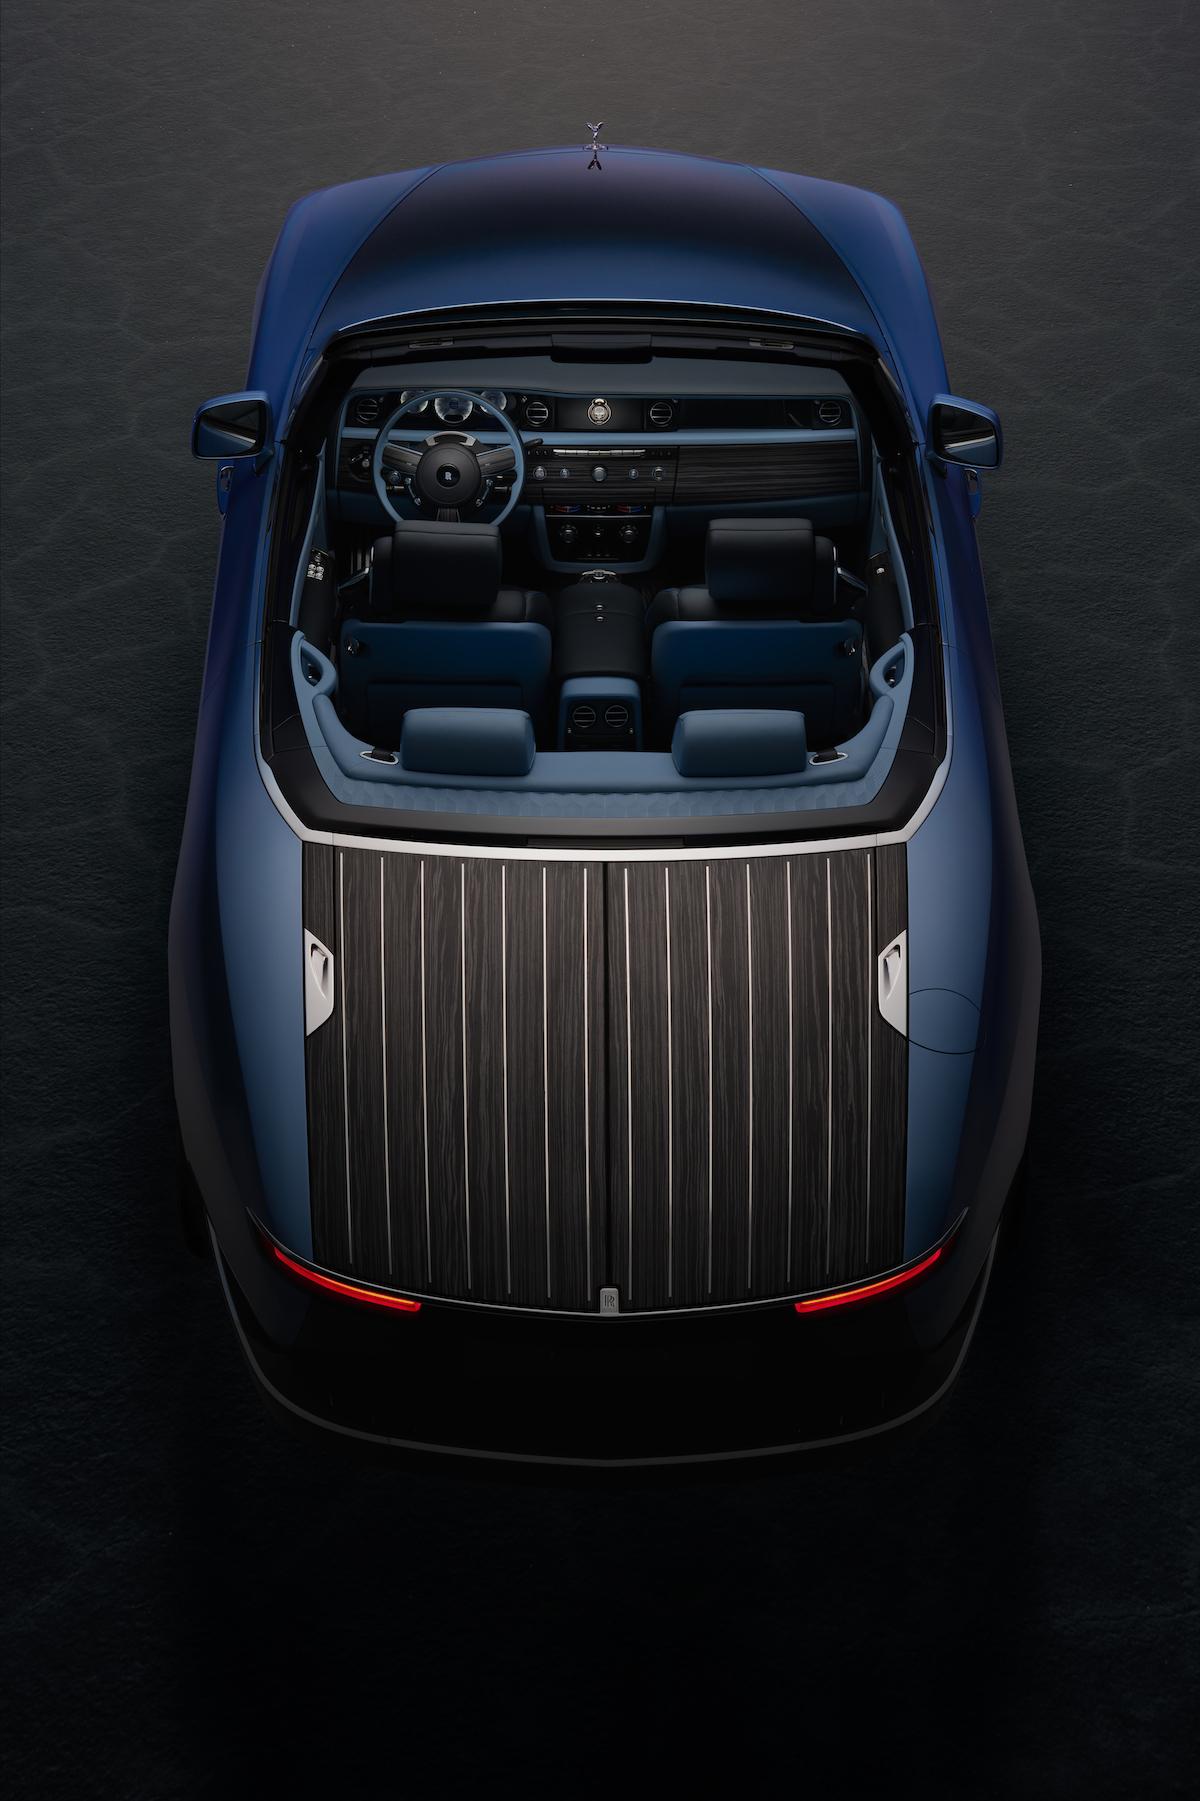 marine blue luxury car Rolls Royce Boat Tail rear view on black ground